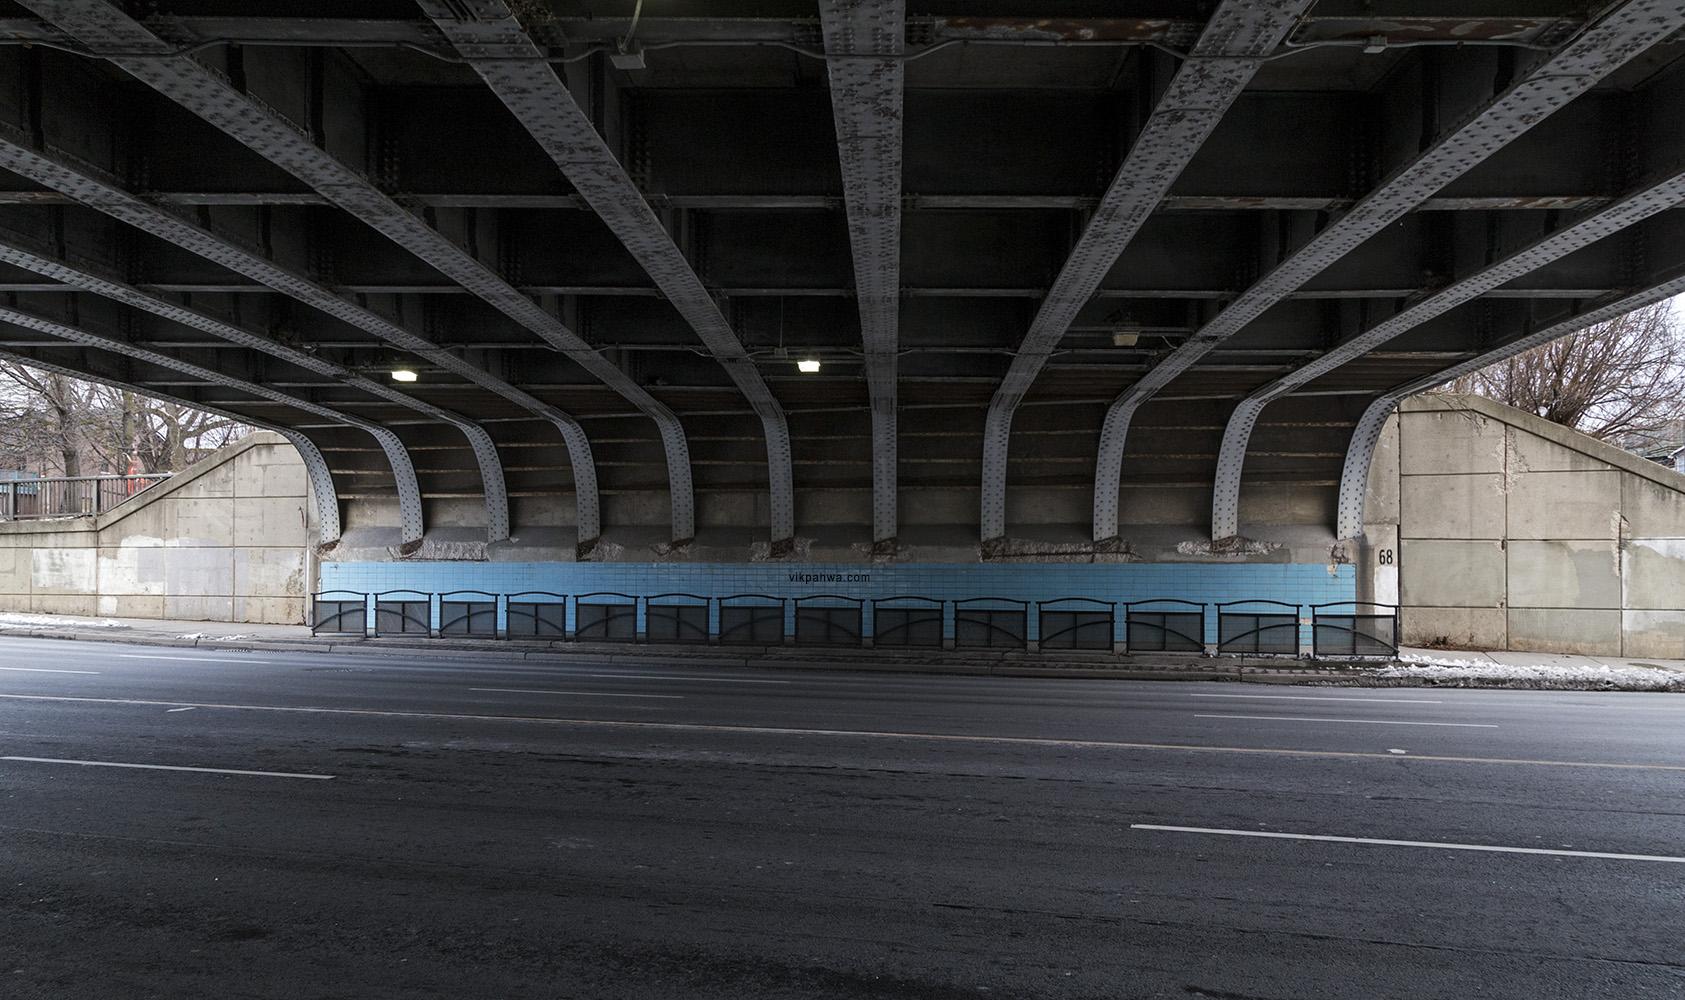 20161230. Striking blue tiles line the sidewalks under Toronto's